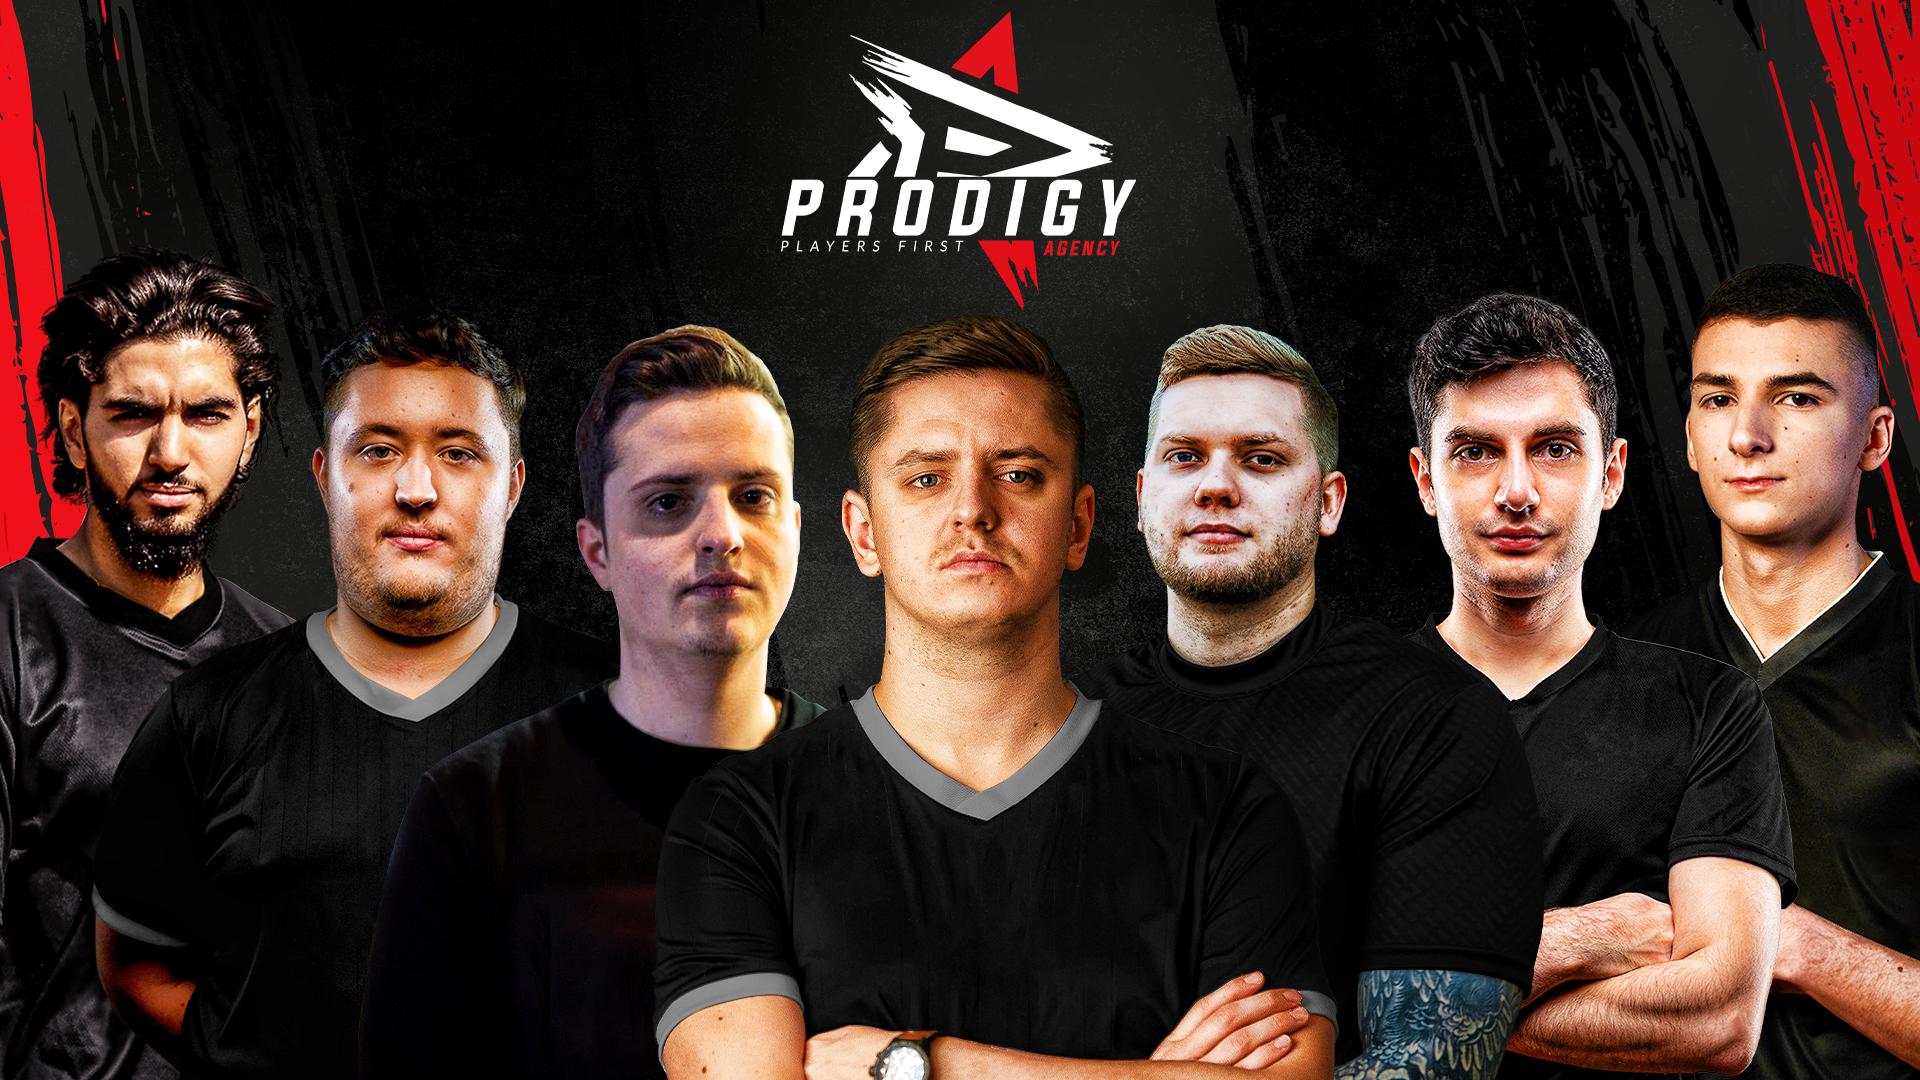 Prodigy Agency Funding